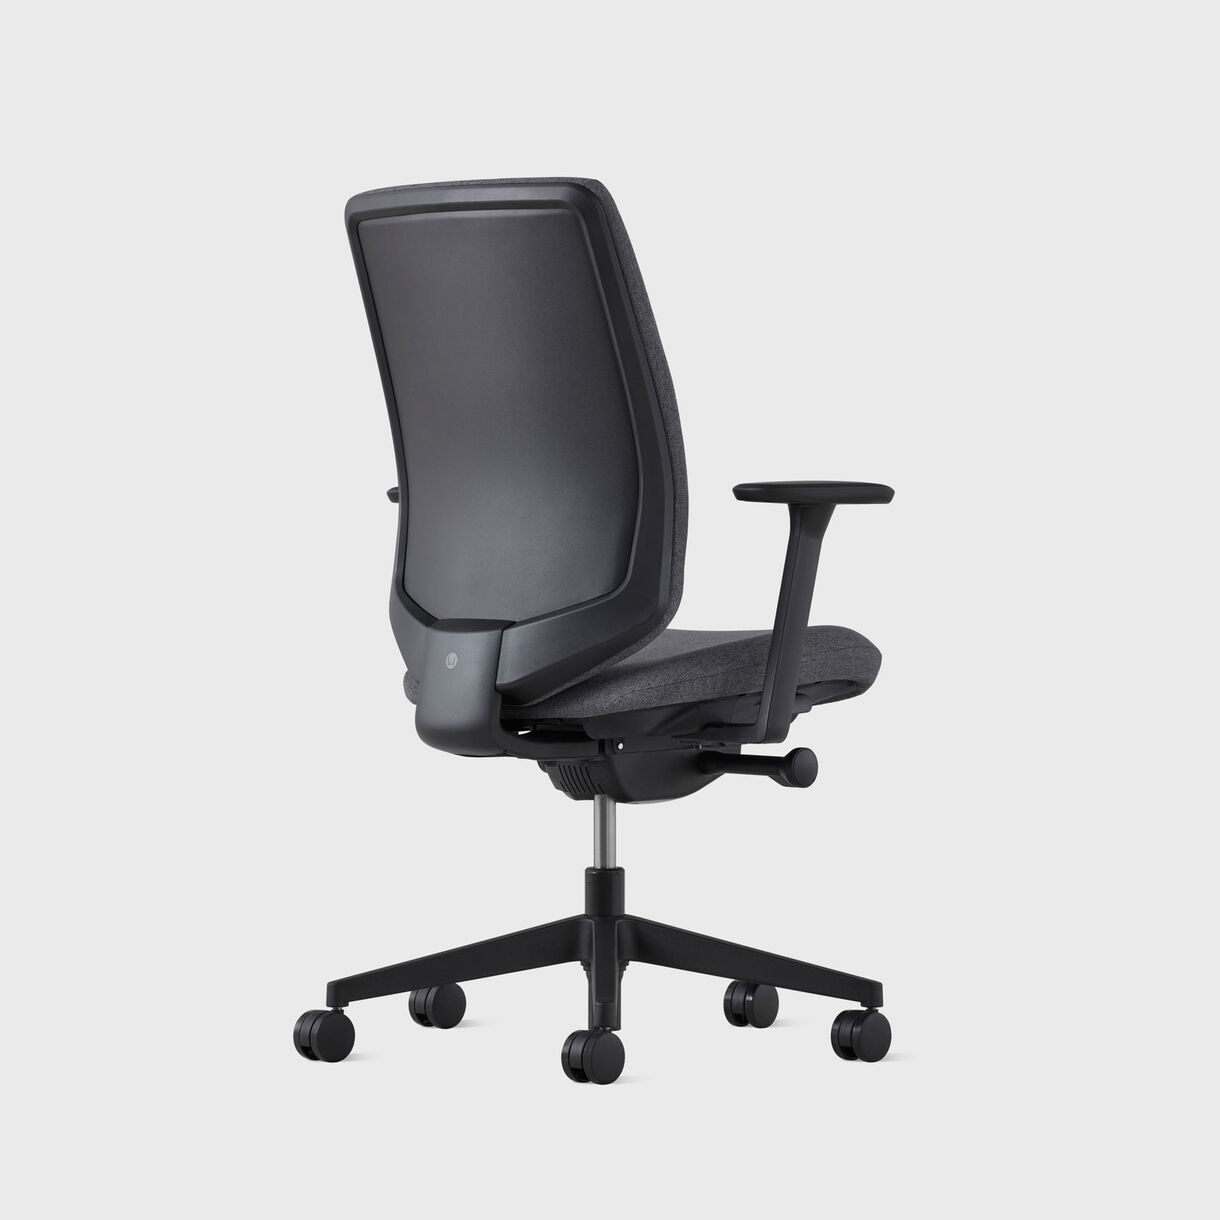 Verus Upholstered Back Task Chair - Black Frame & Bayou Upholstery - Fully Adjustable Arms